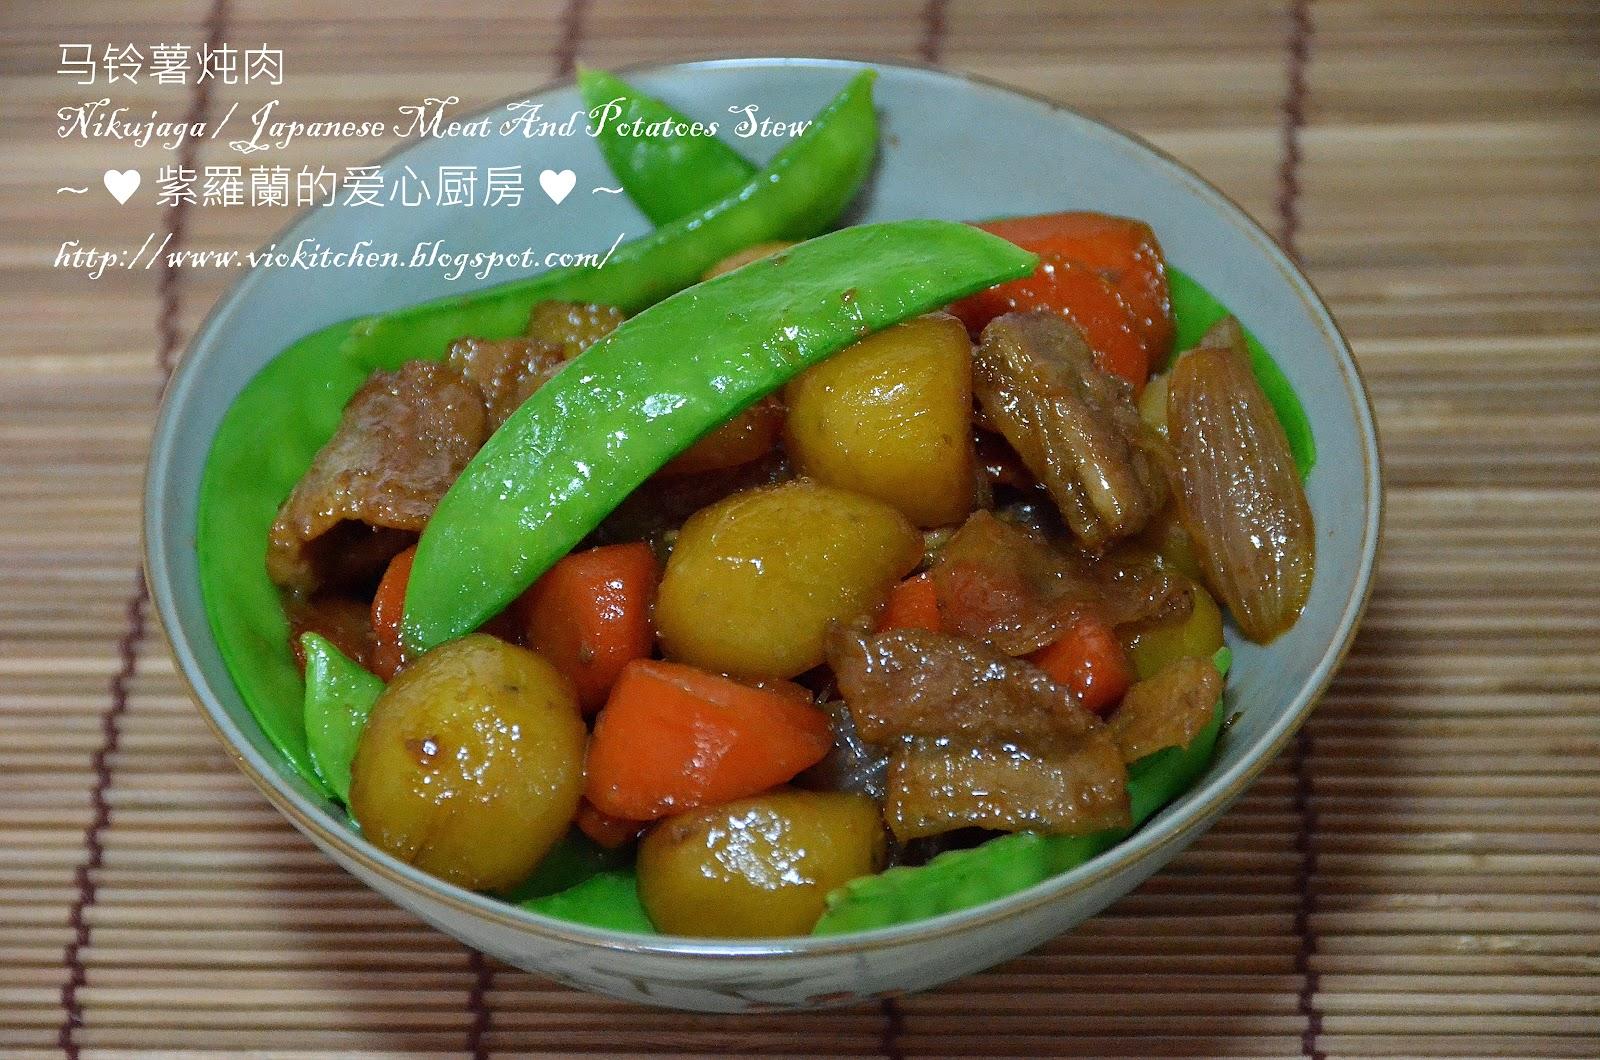 Violet's Kitchen ~♥紫羅蘭的愛心廚房♥~ : 馬鈴薯燉肉 ...